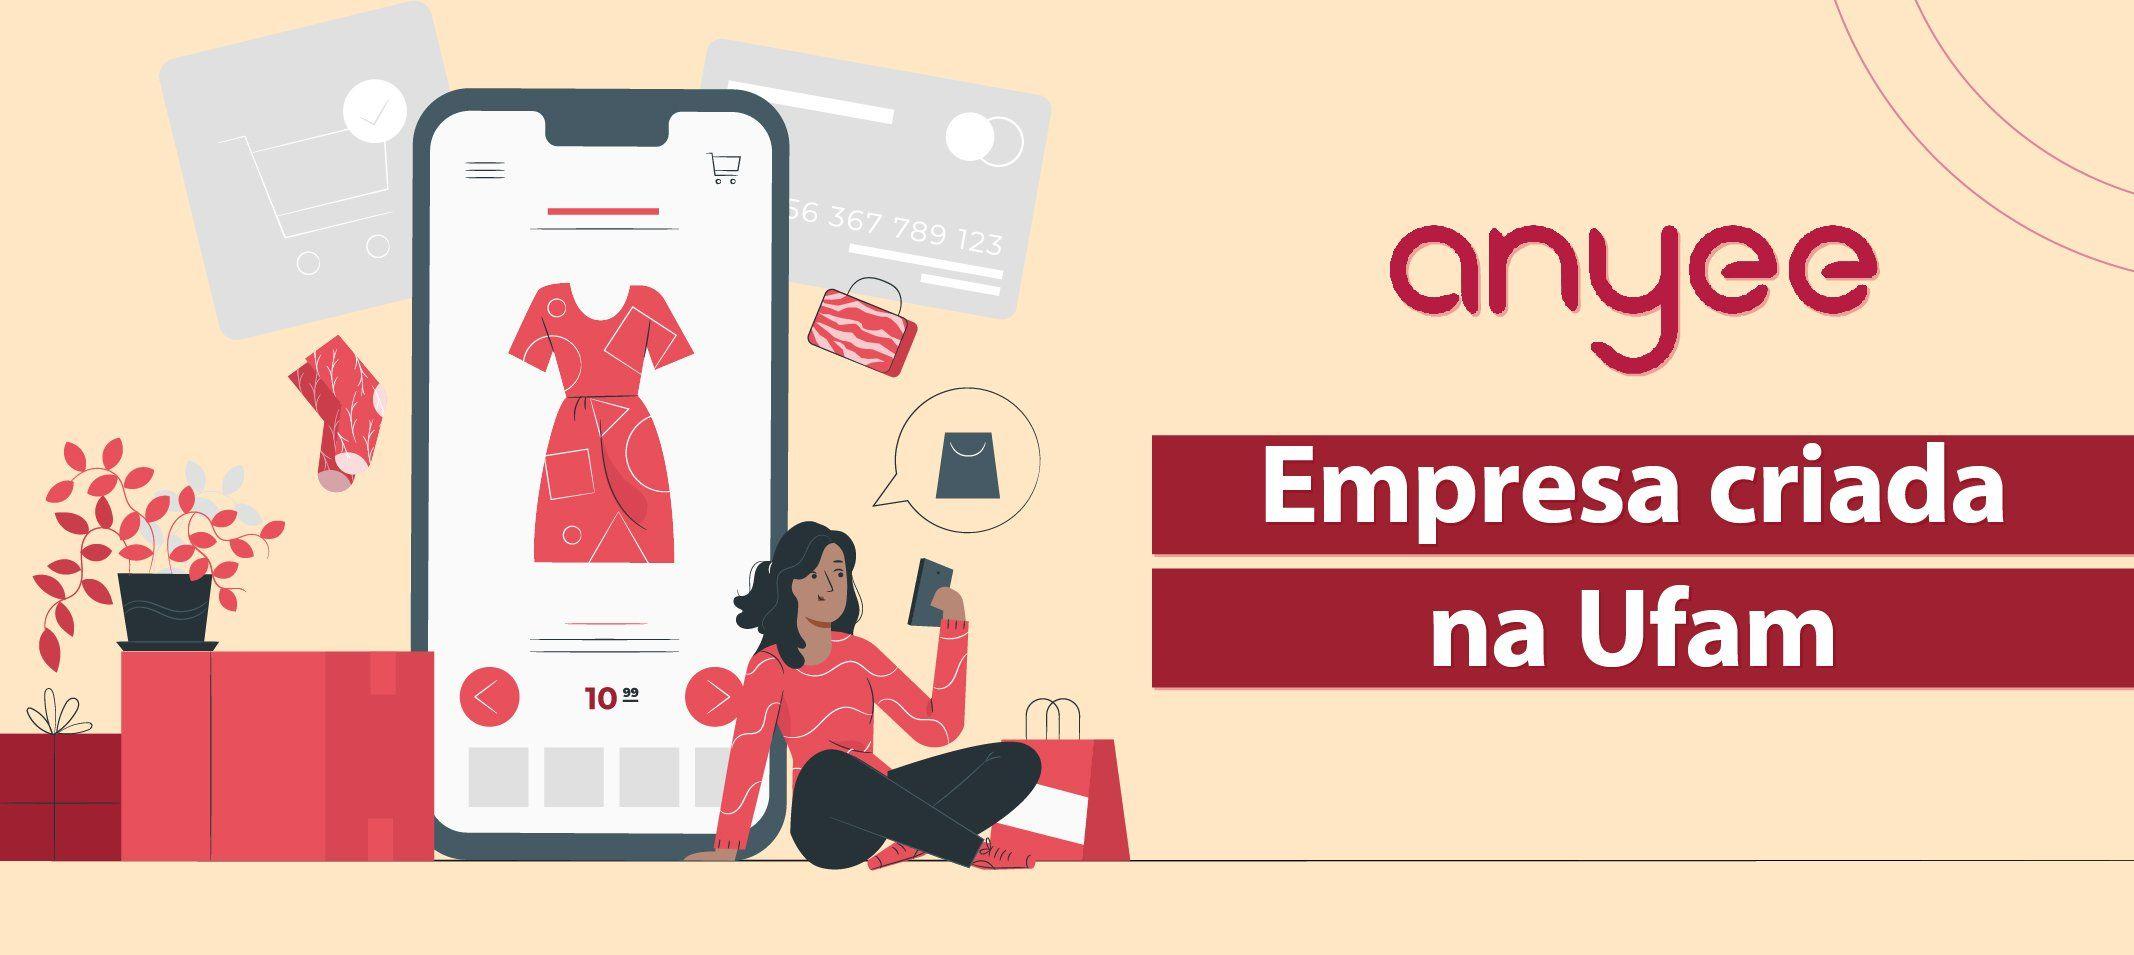 Anyee Marketplace - Empresa criada na Ufam reúne lojas online de Manaus